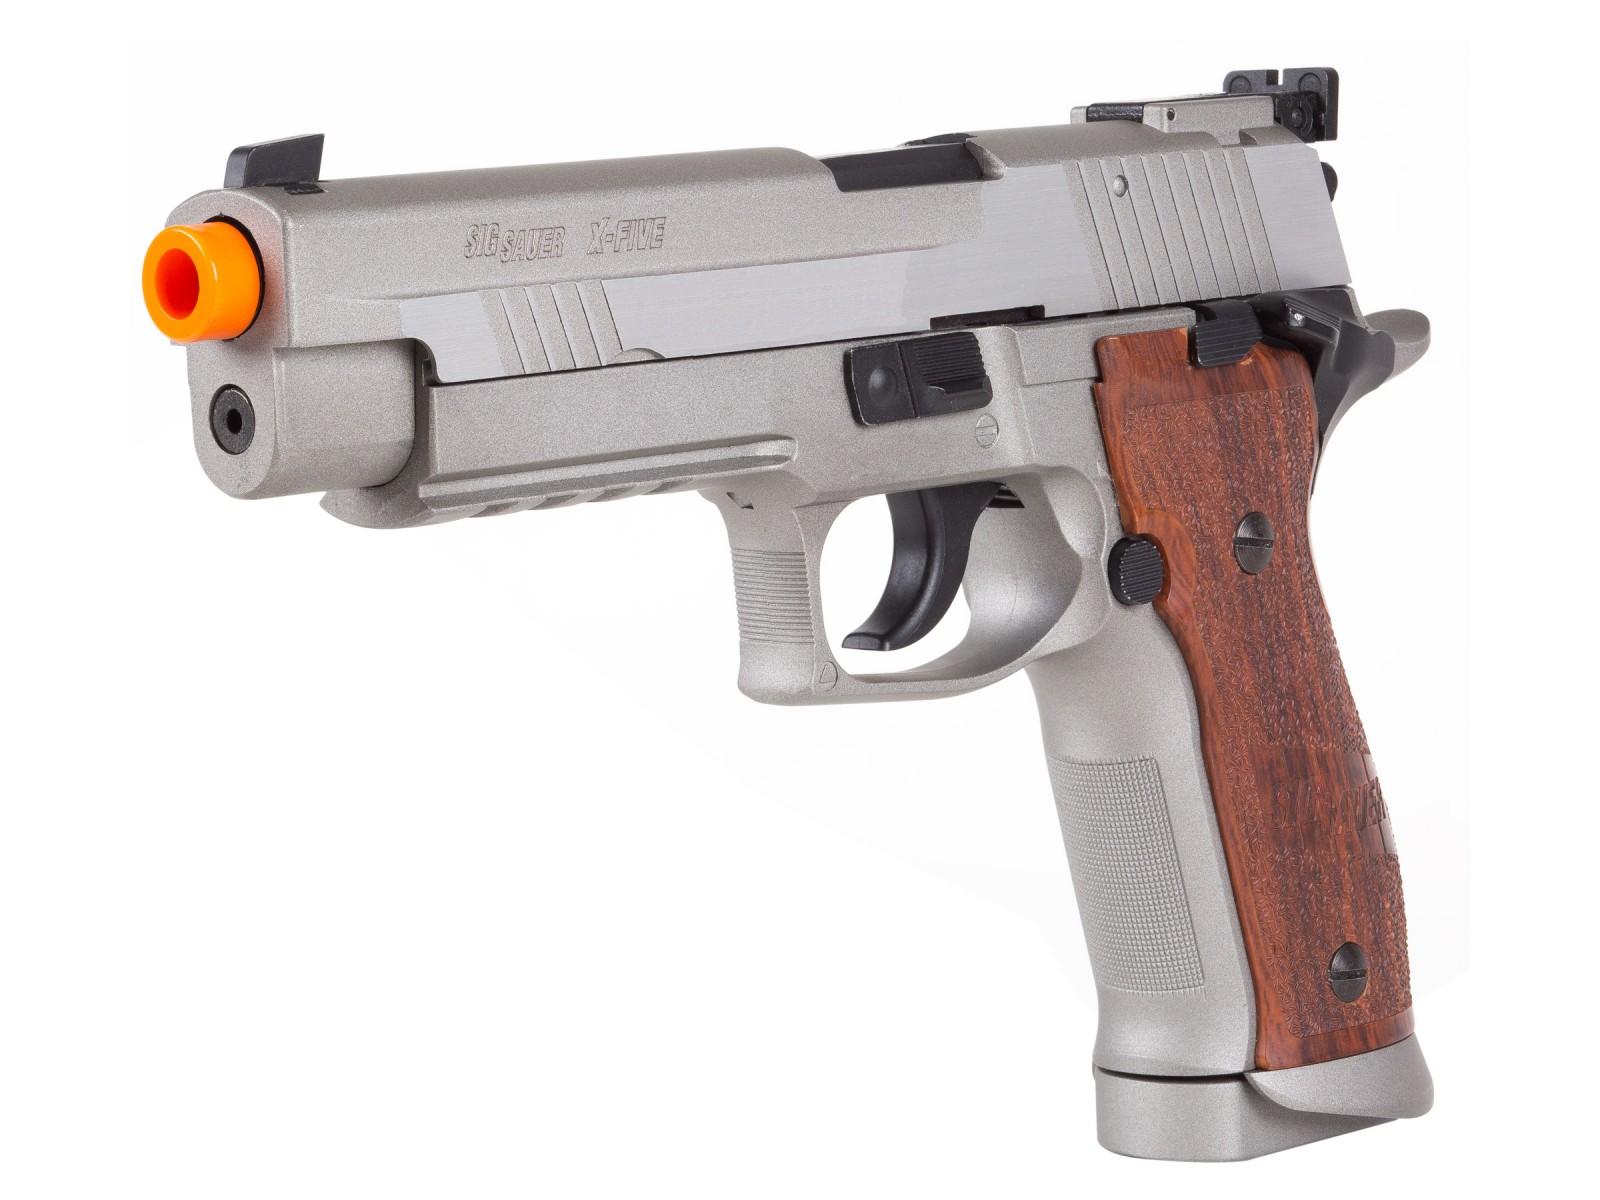 SIG_Sauer_P226_XFIVE_Metal_Co2_GBB_Airsoft_Pistol_Silver_6mm